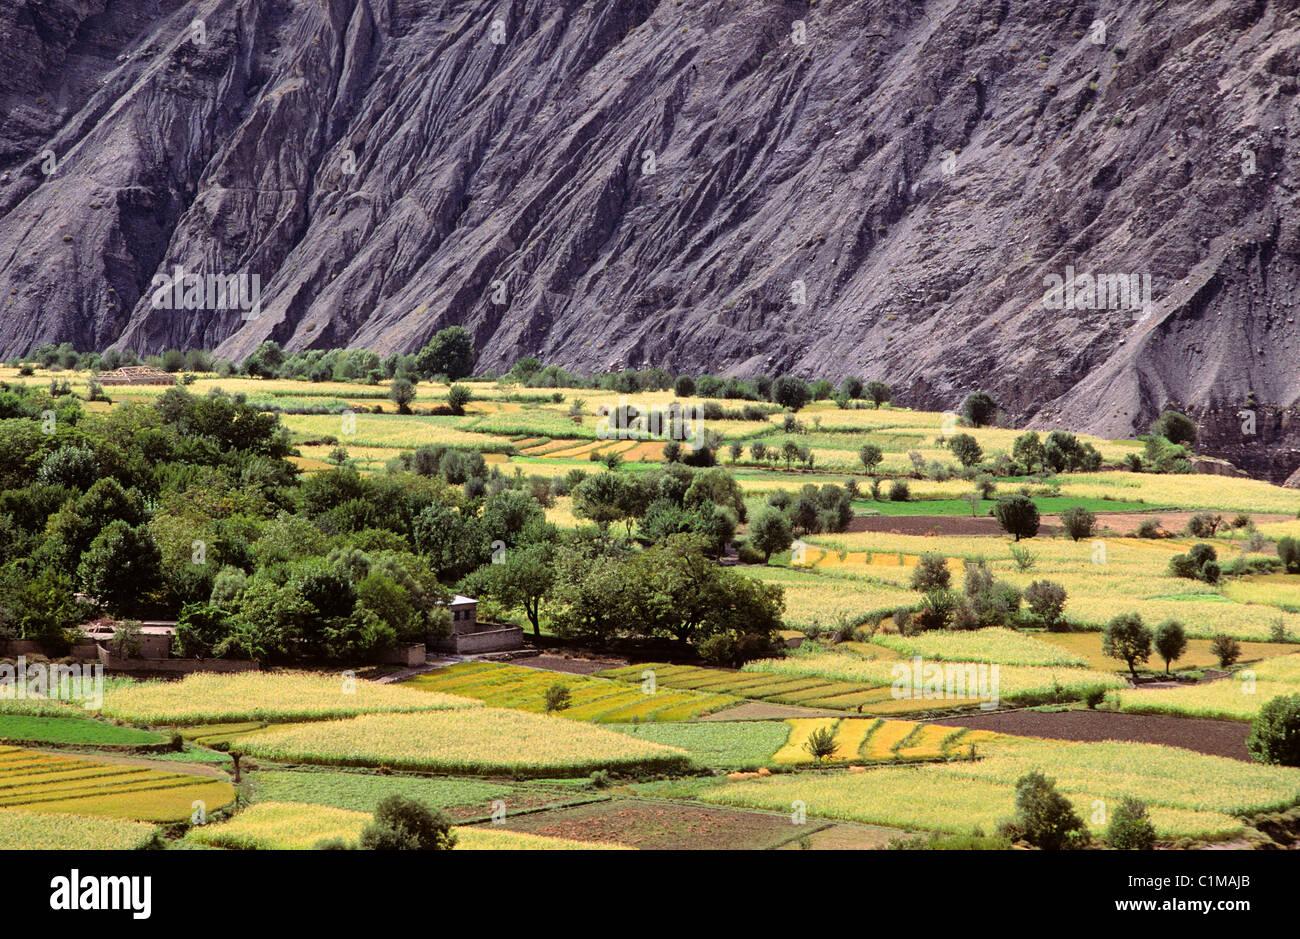 Pakistan, North Region, region of Chitral - Stock Image